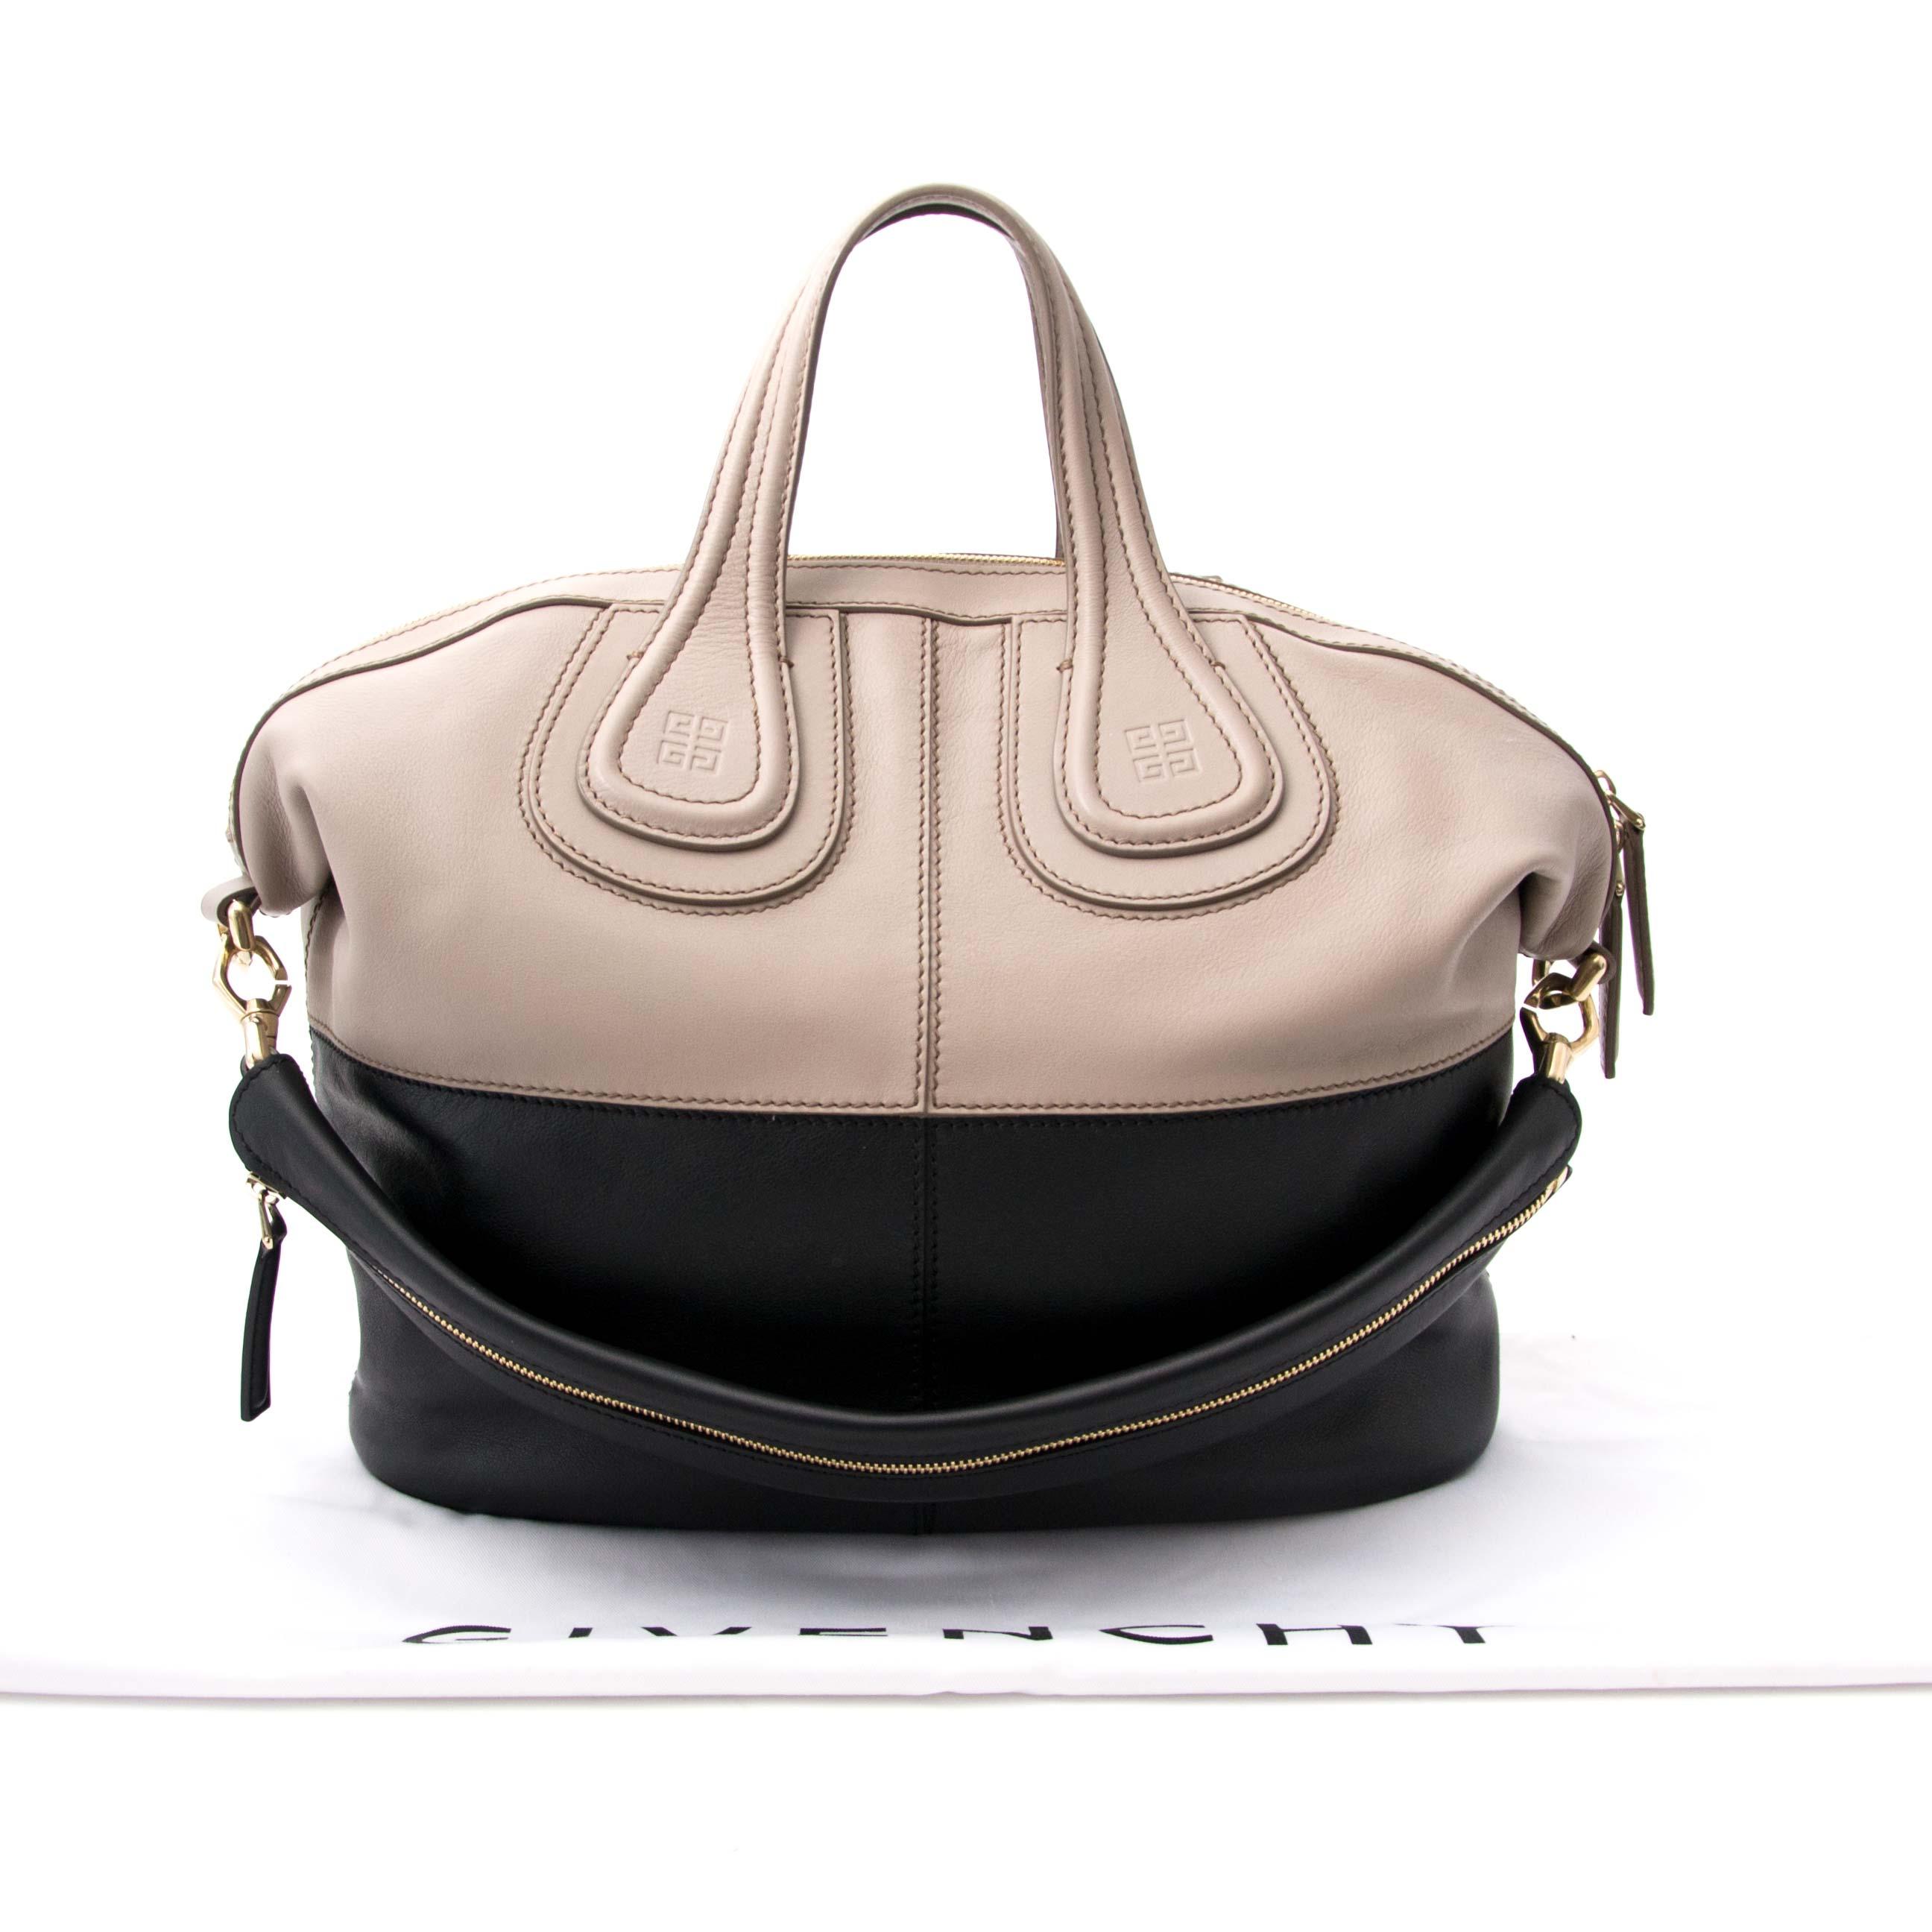 shop online jour secondhand Givenchy Nightingale Medium Bicolor Shoulder Bag